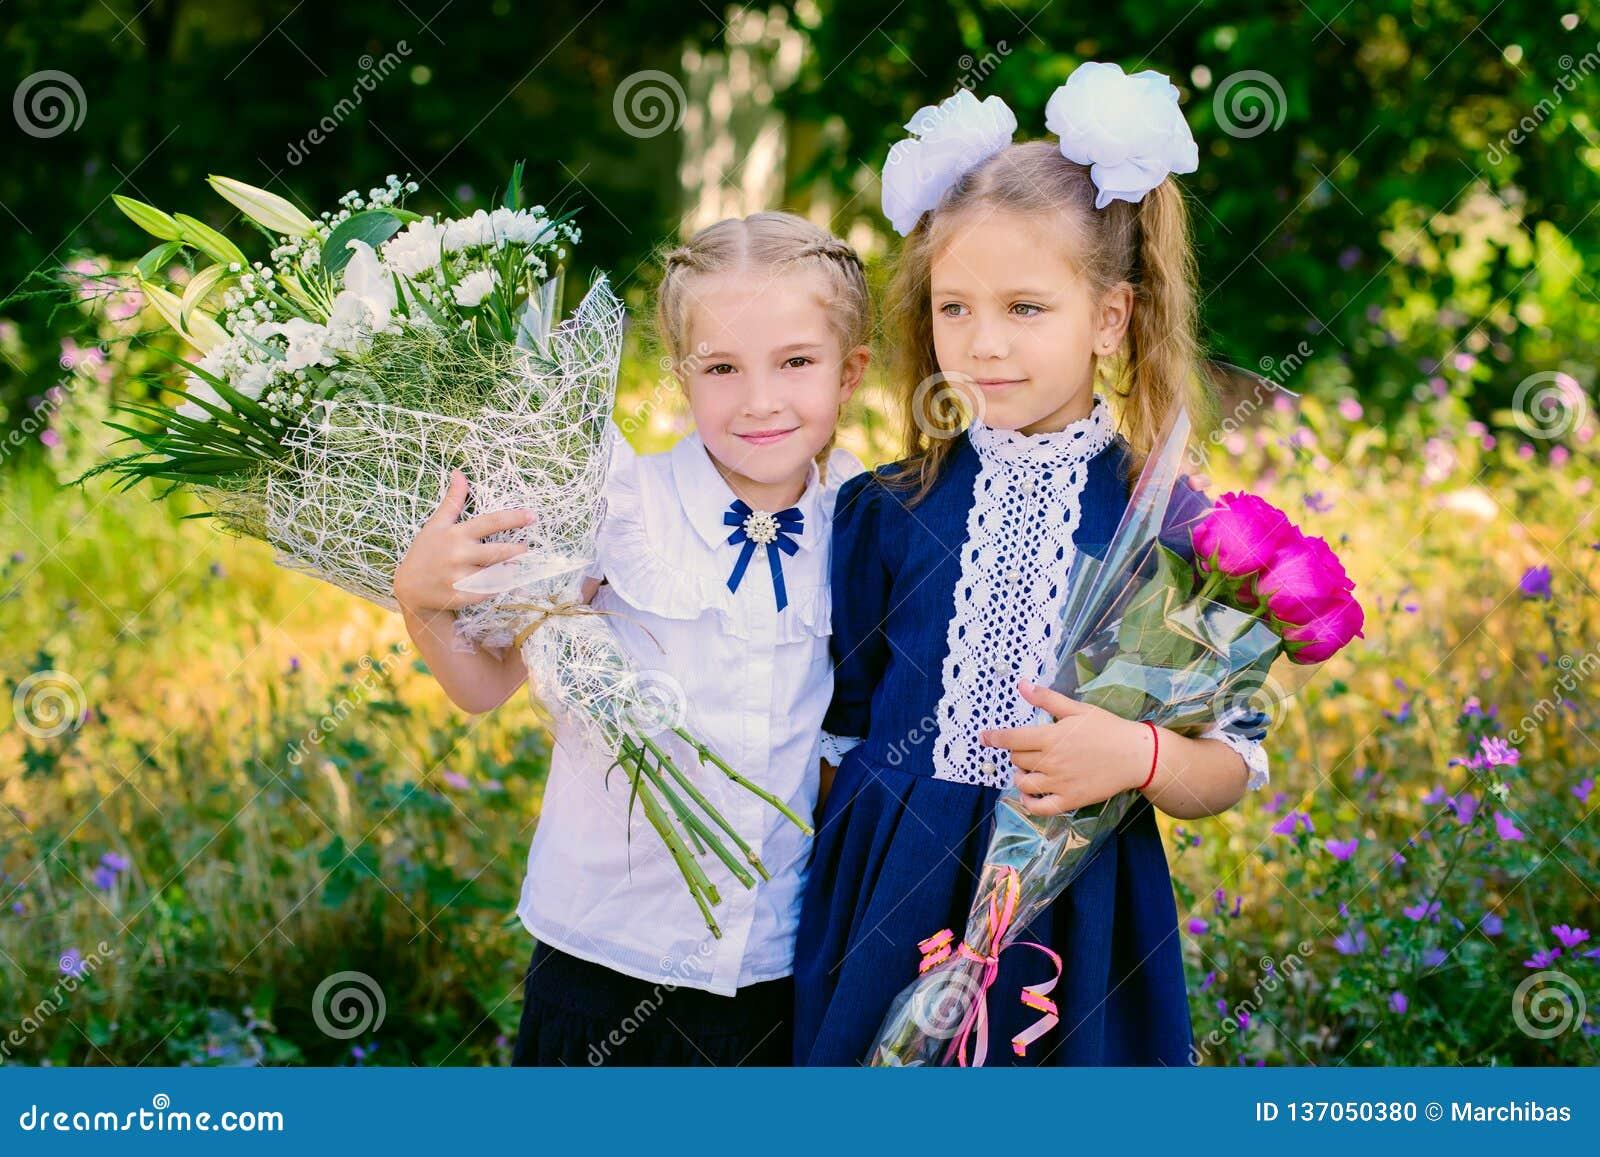 Two happy little schoolgirls with bouquets